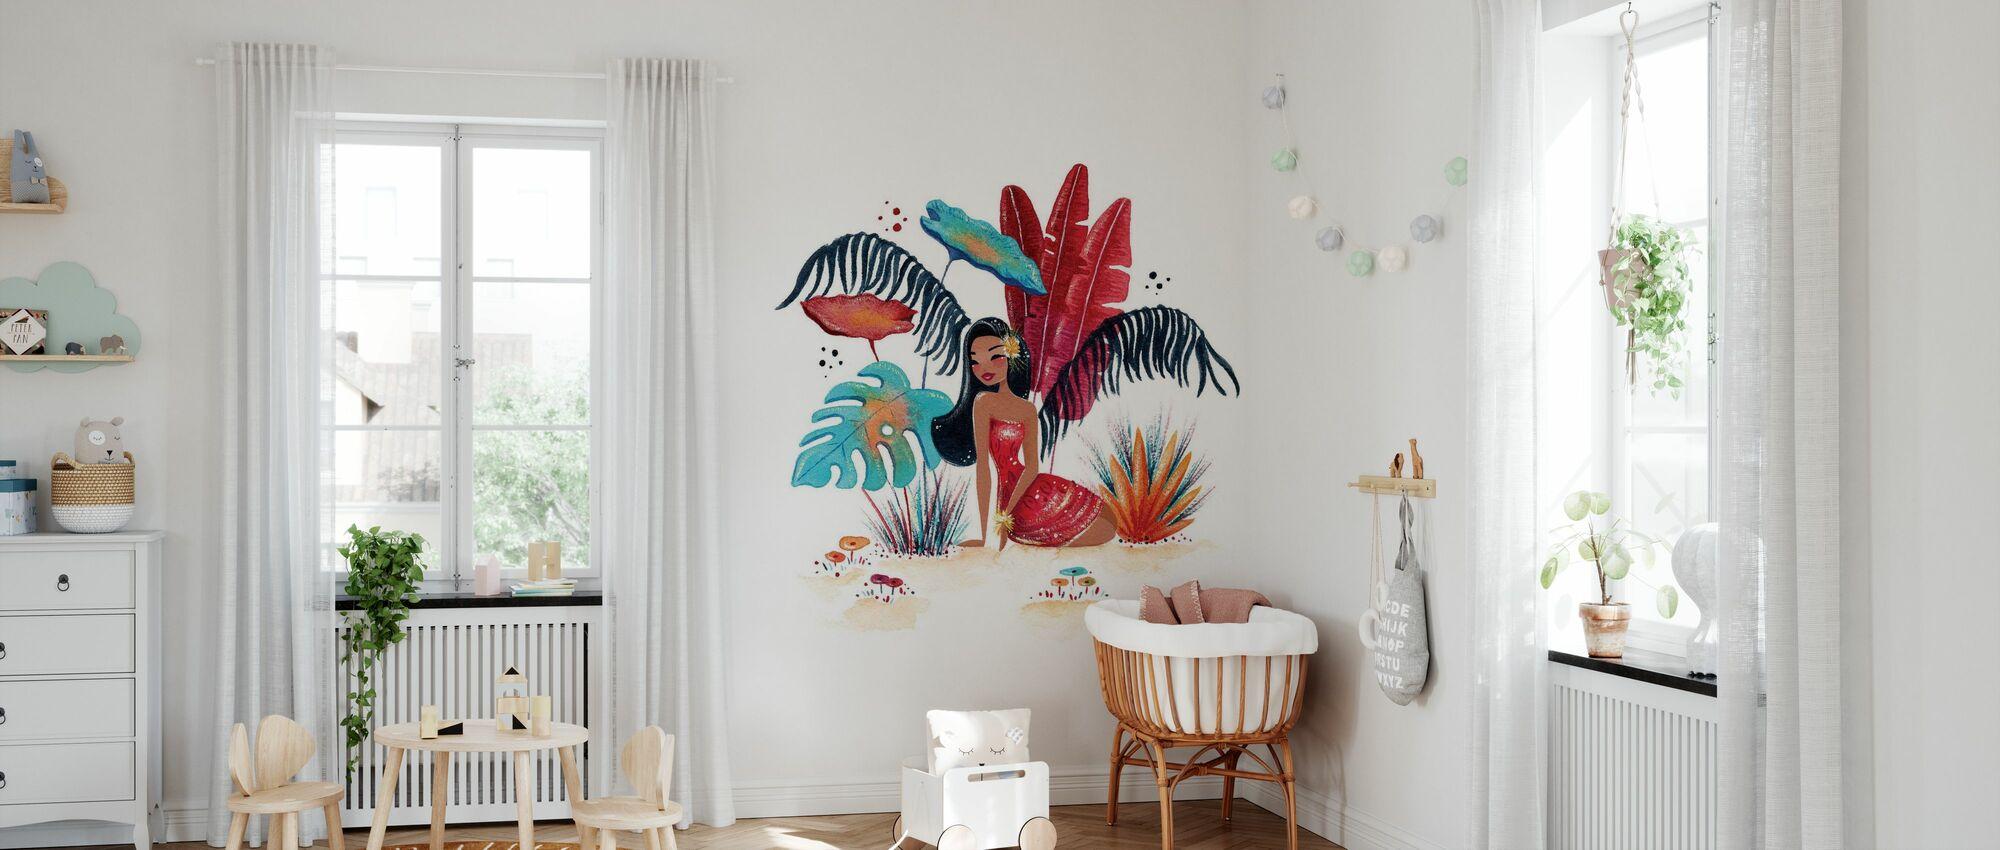 Fantastic Tropic III - Wallpaper - Nursery